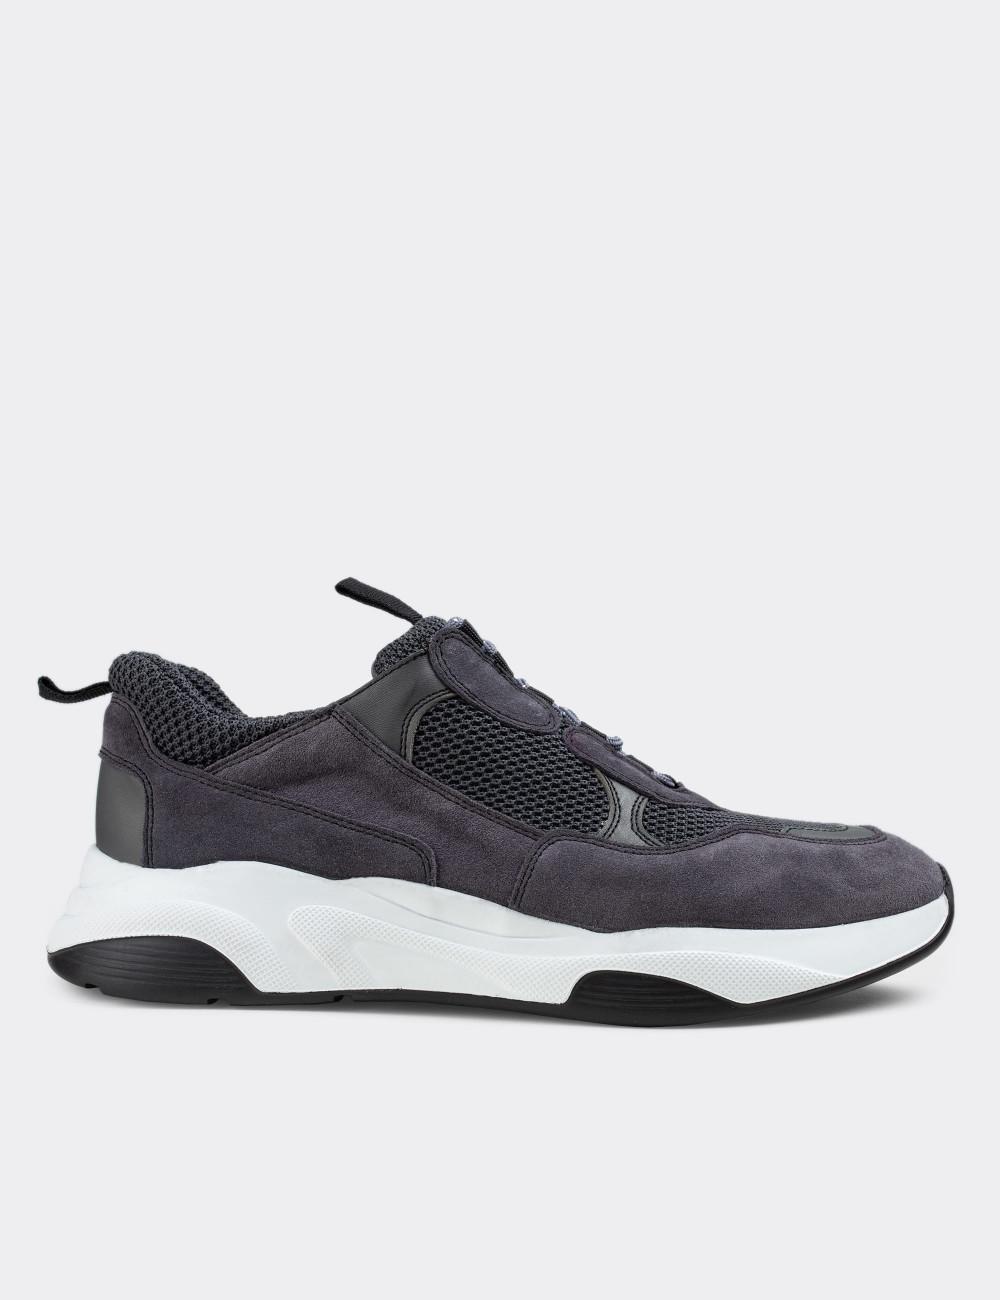 Hakiki Süet Gri Sneaker Erkek Ayakkabı - 01724MGRIE02